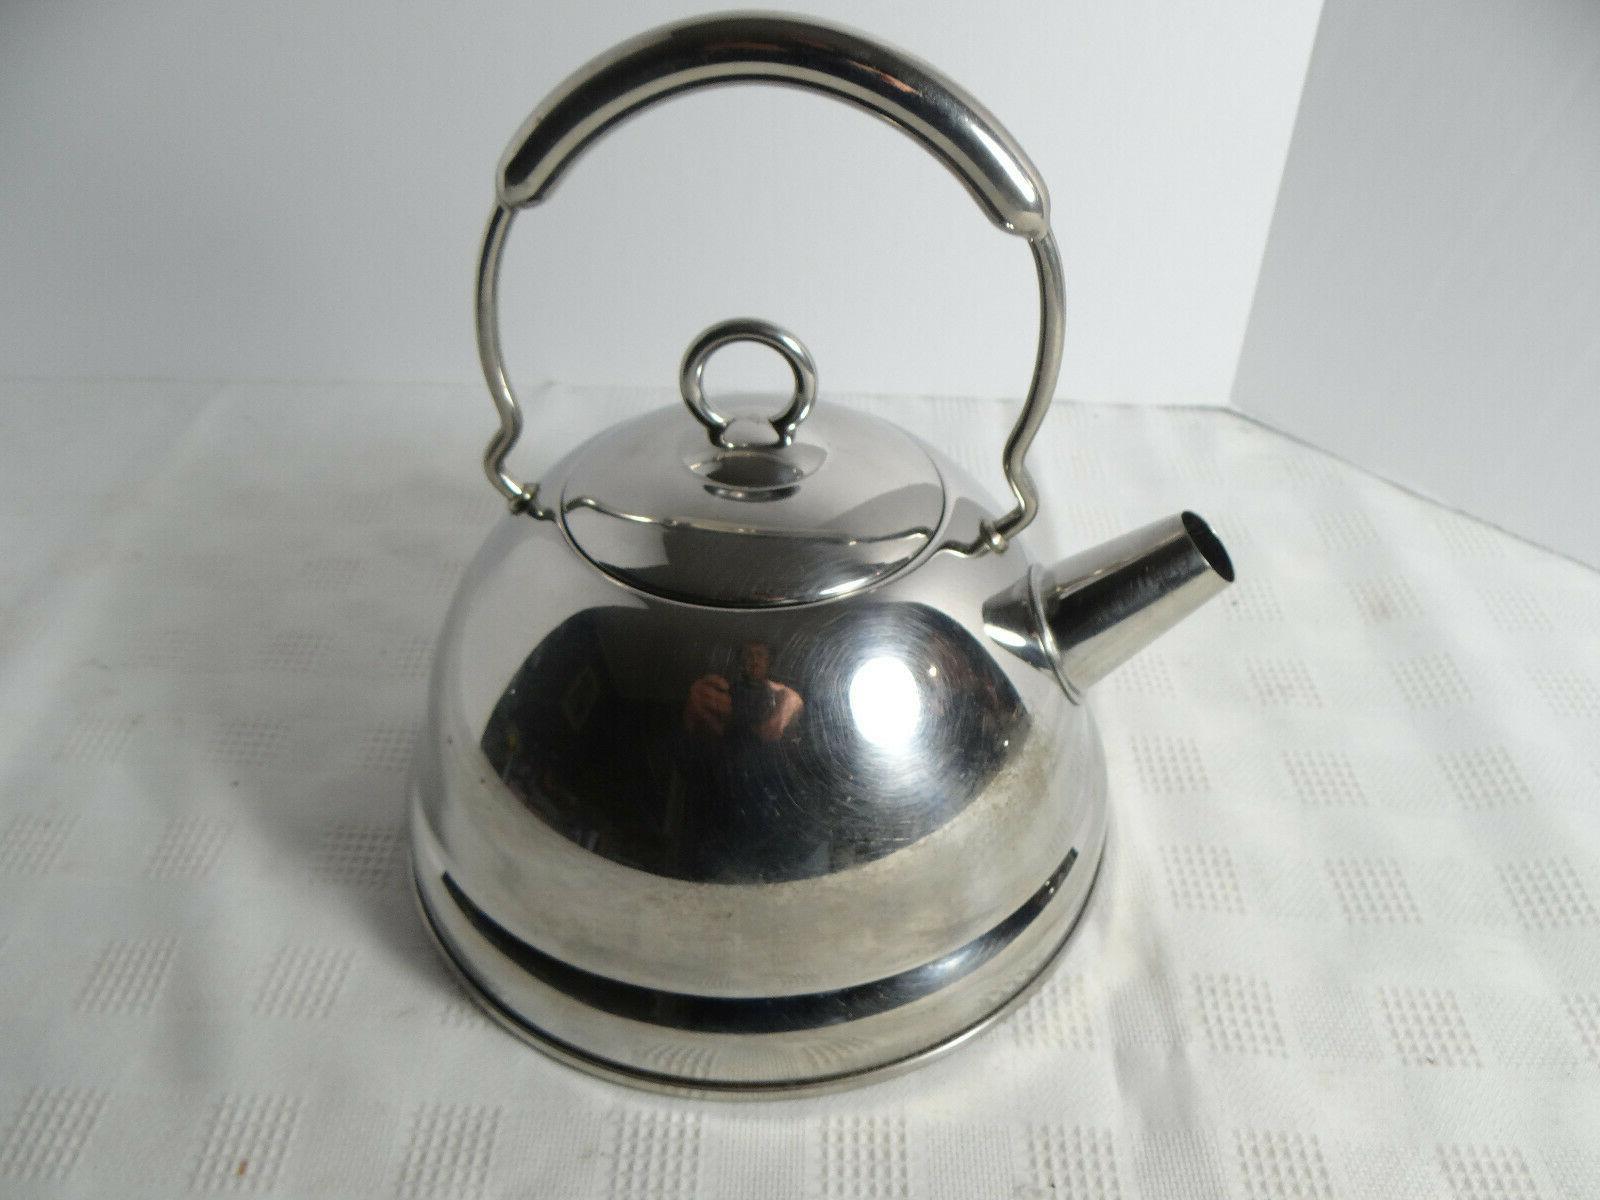 Vintage Copco Stainless Tea Kettle Made Korea